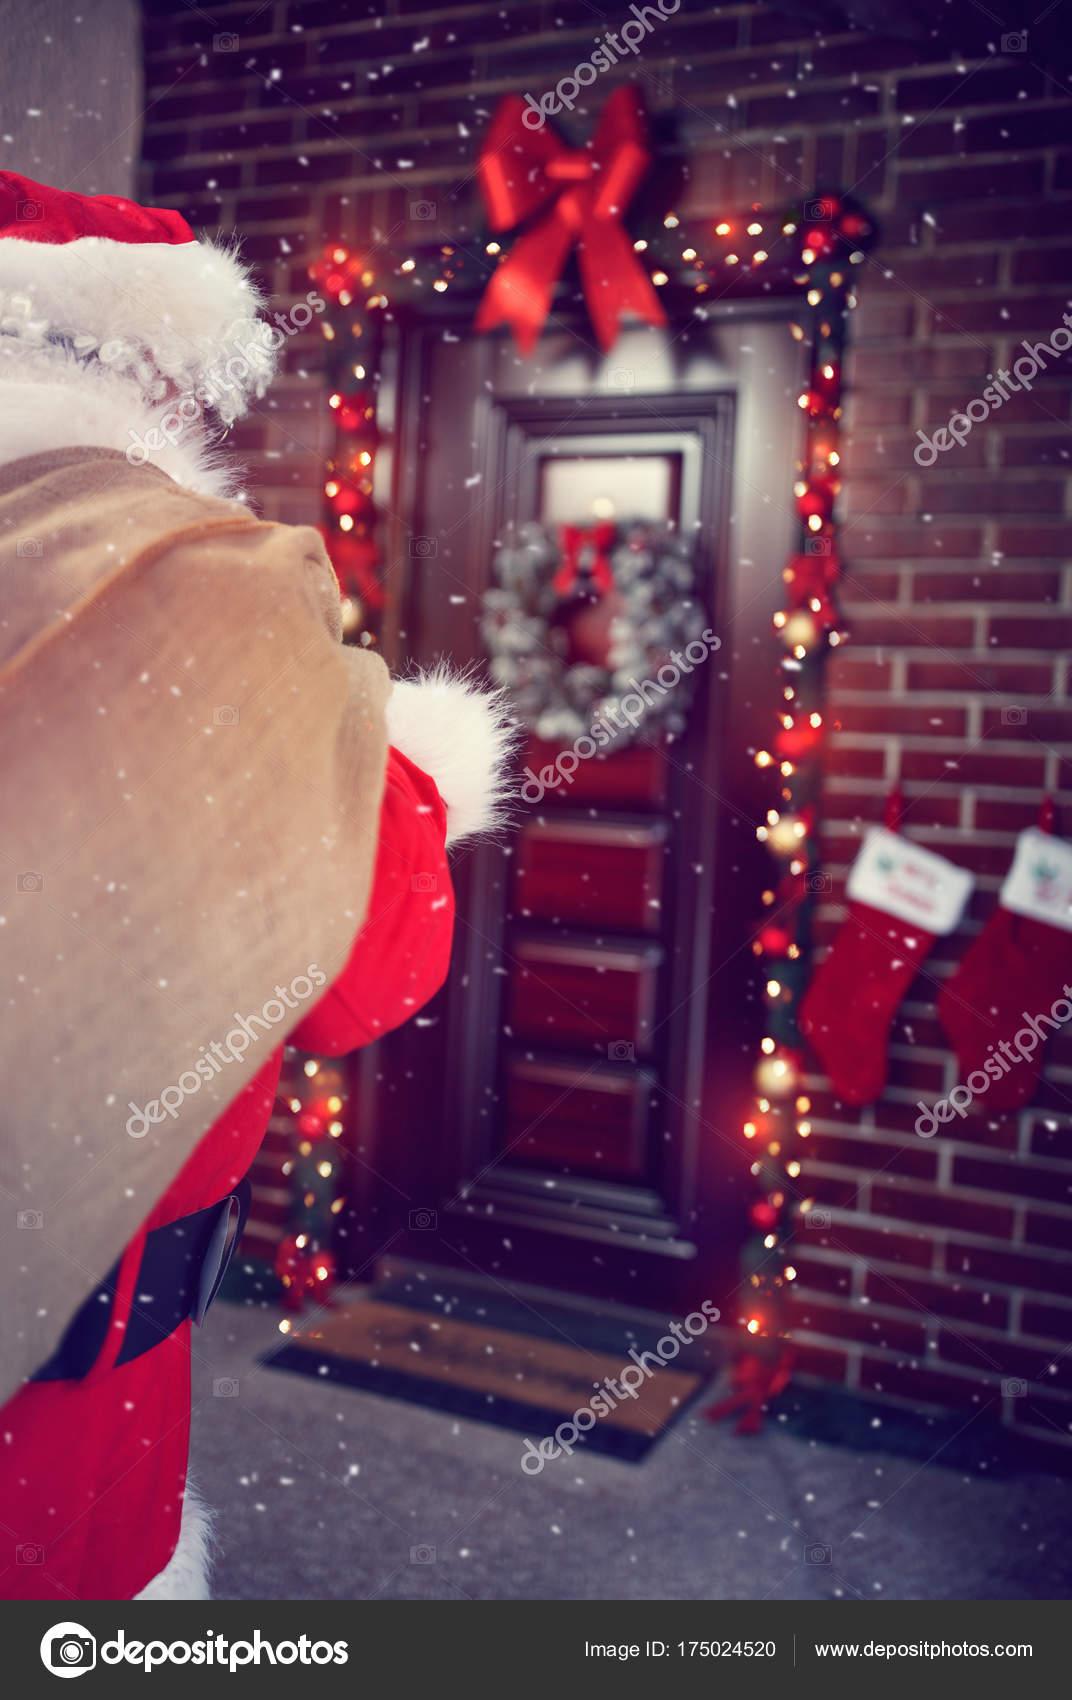 Babbo Natale In Casa.Arrivo Di Babbo Natale In Casa Foto Stock C Luckybusiness 175024520